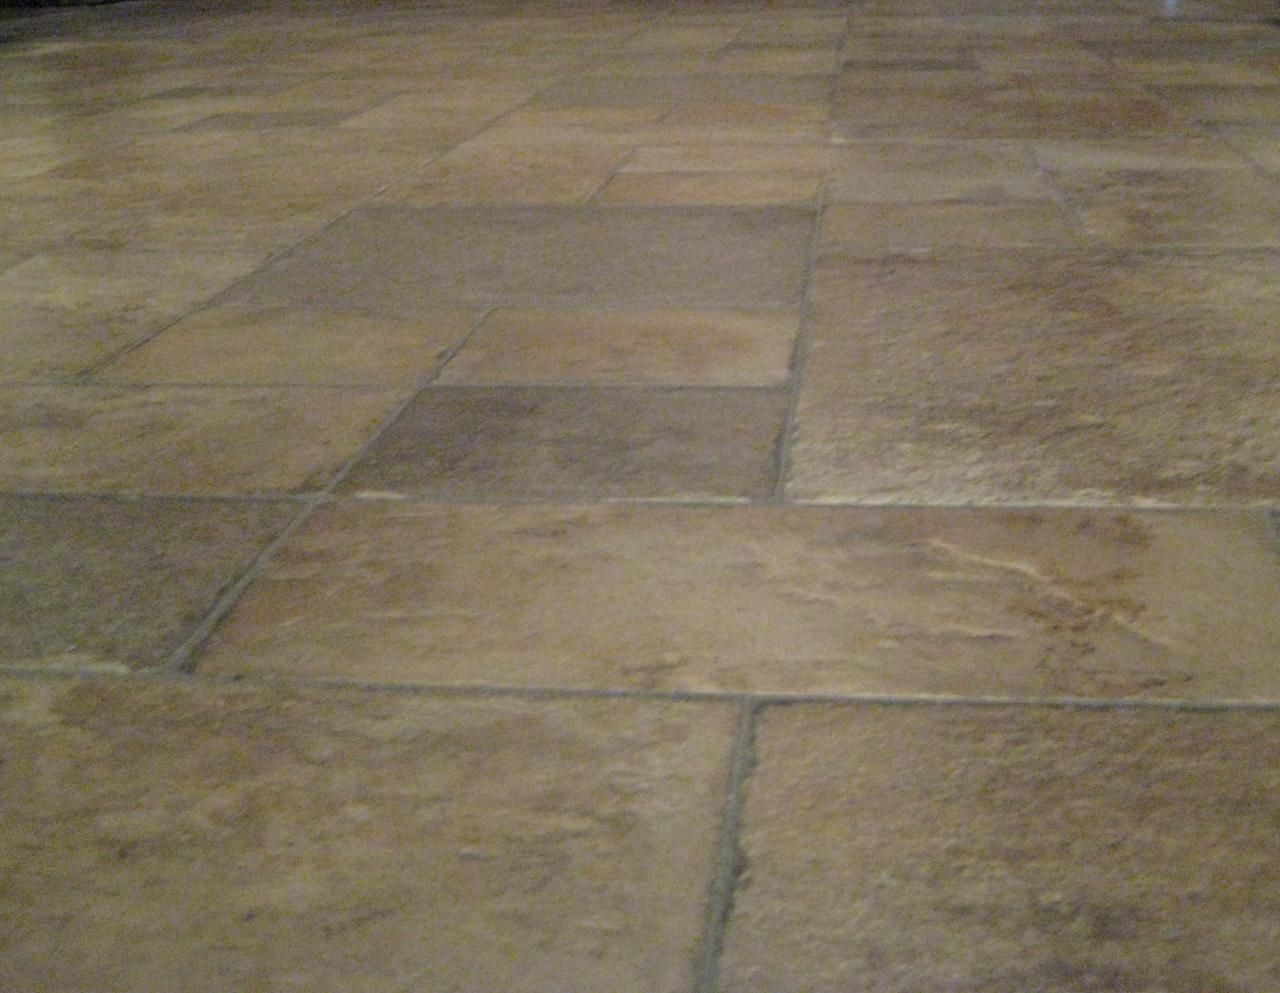 Indoor Stone Flooring Tile | Floor Tile Patterns and ...